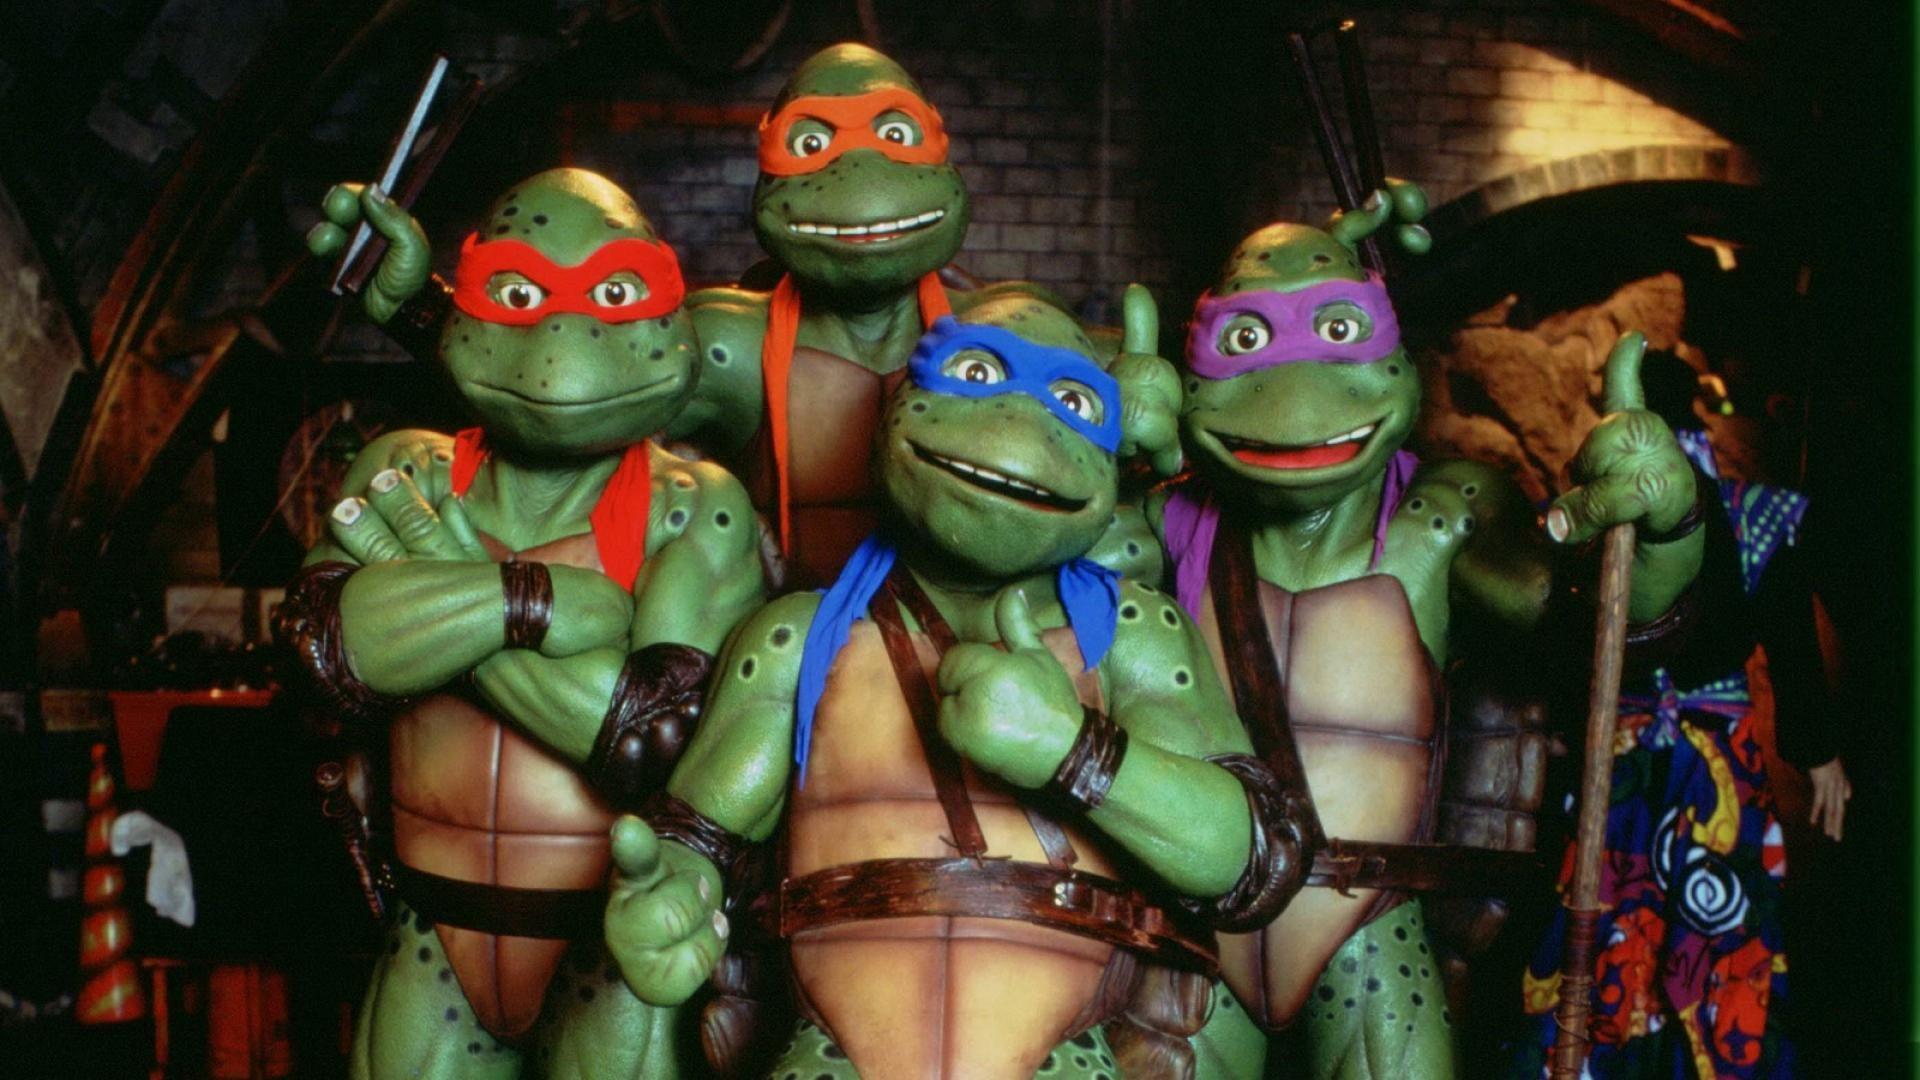 Teenage Mutant Ninja Turtles Wallpapers Group 1920x1080 Turtle 37